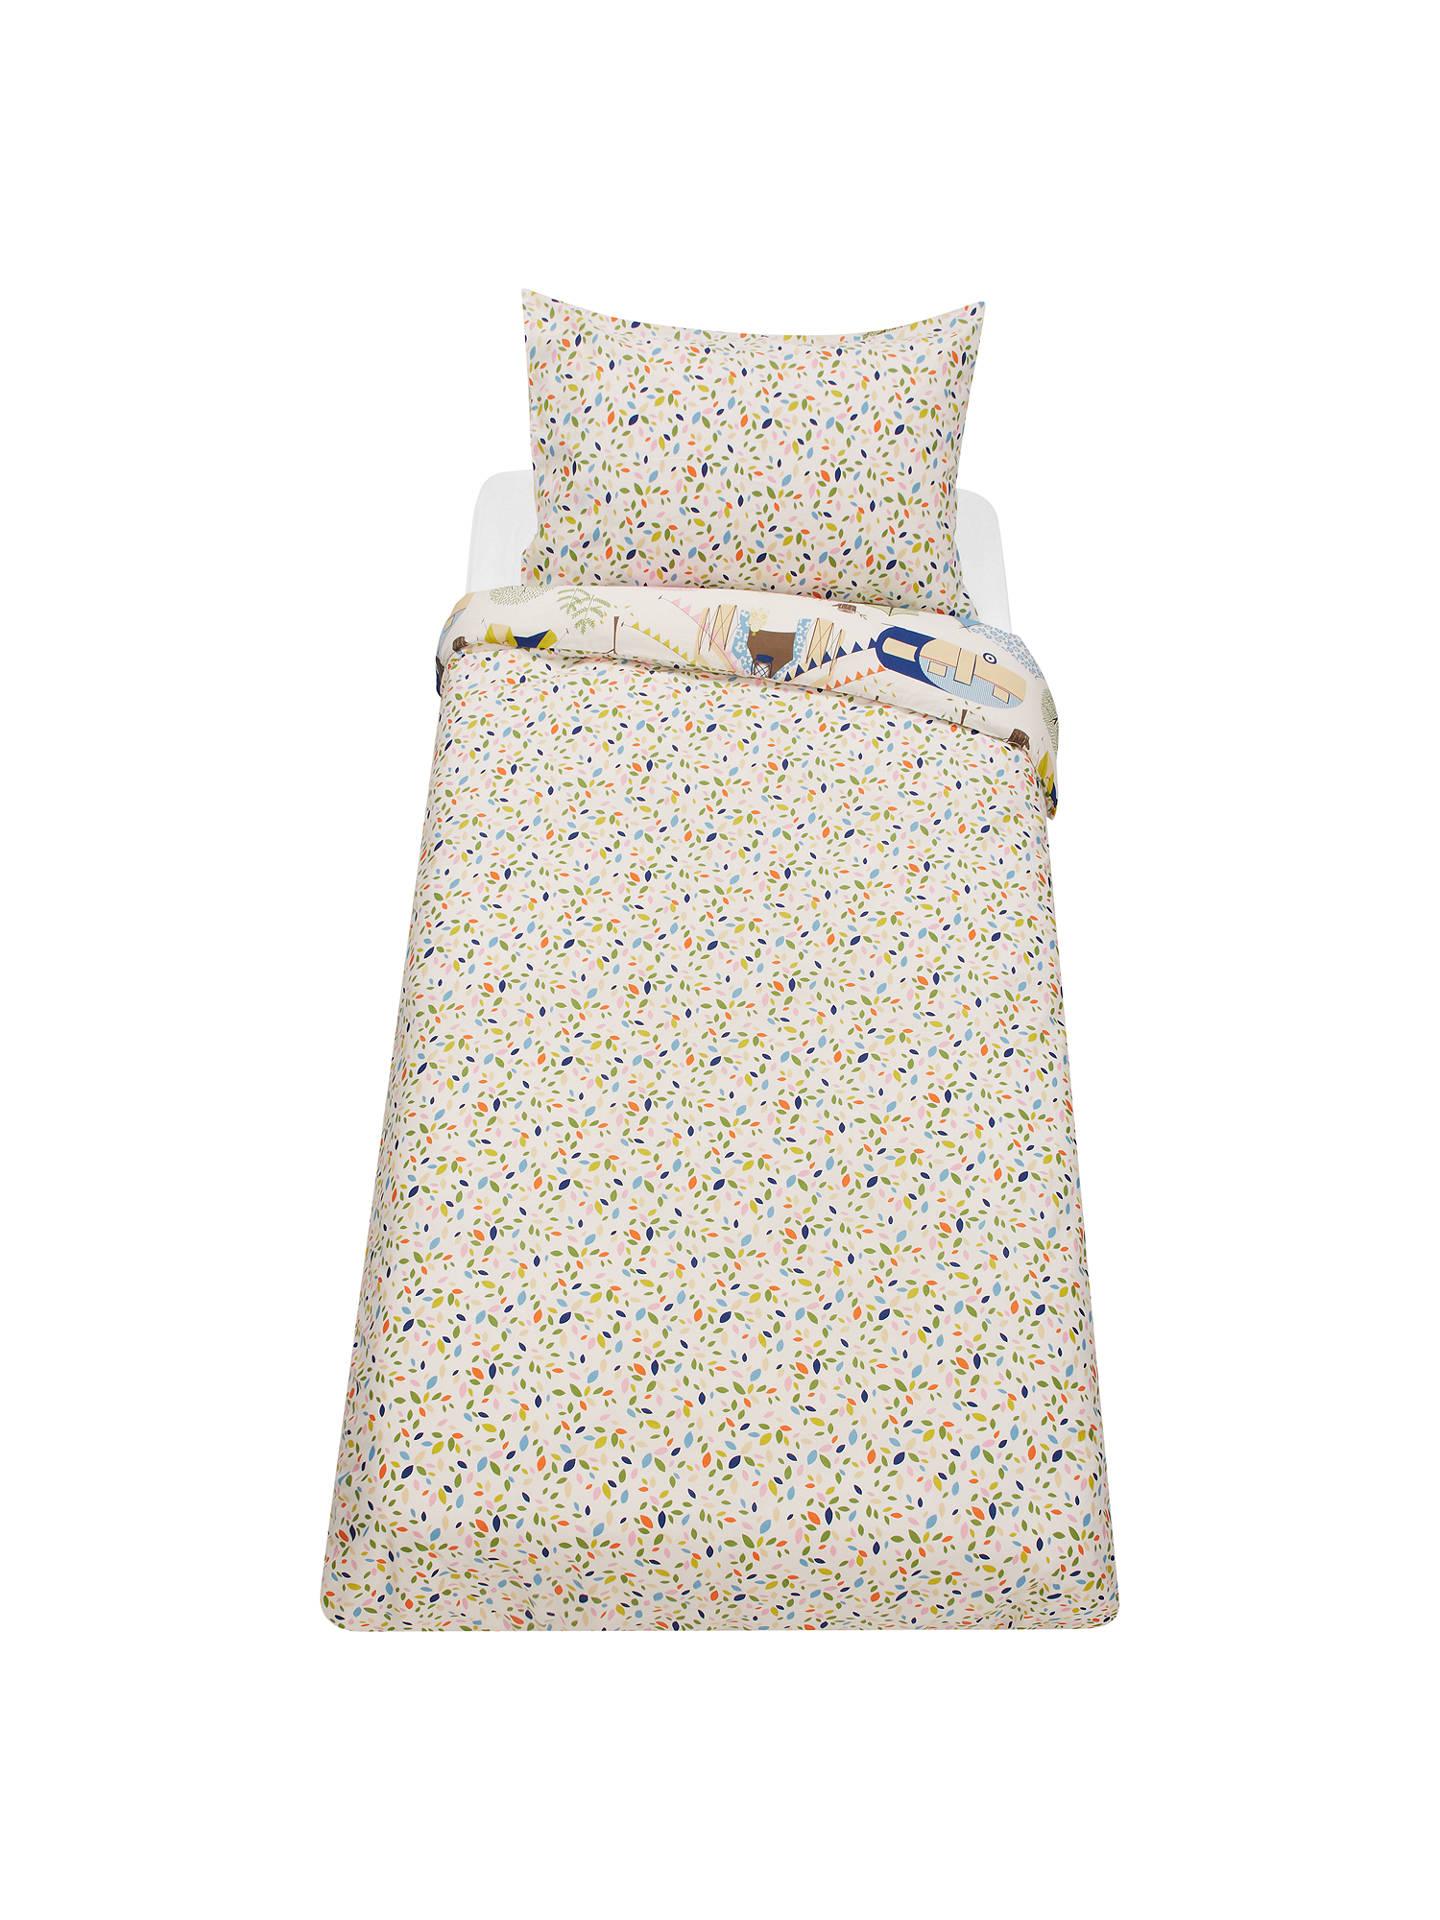 little home at John Lewis Camping Reversible Duvet Cover and Pillowcase Set, Single, Multi